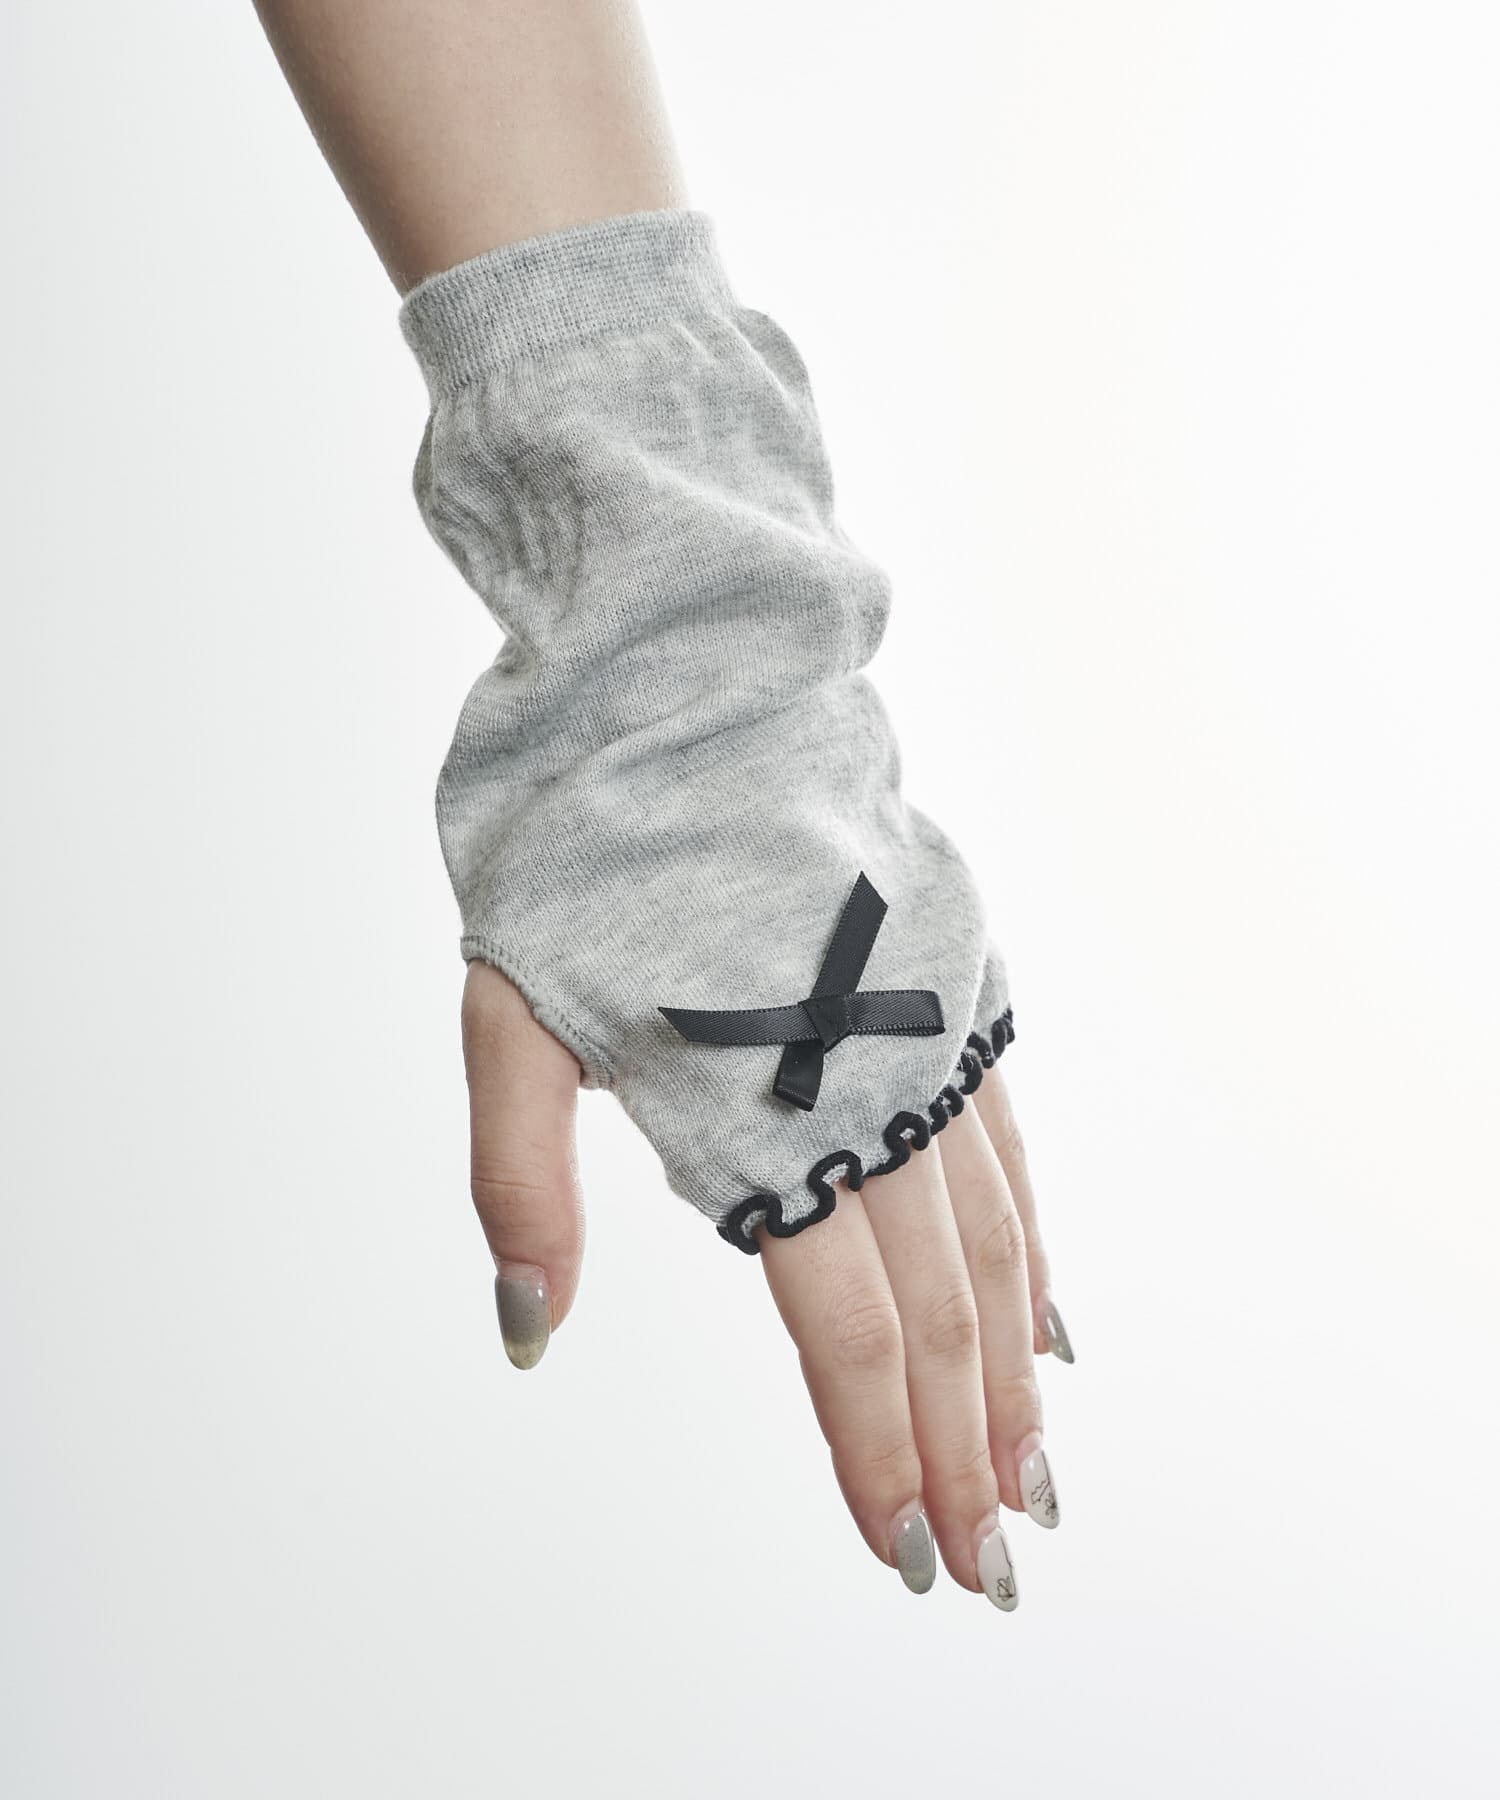 3COINS(スリーコインズ) ライフスタイル 【快適な日差し対策】冷感リボン付きアームカバーショート丈 グレー